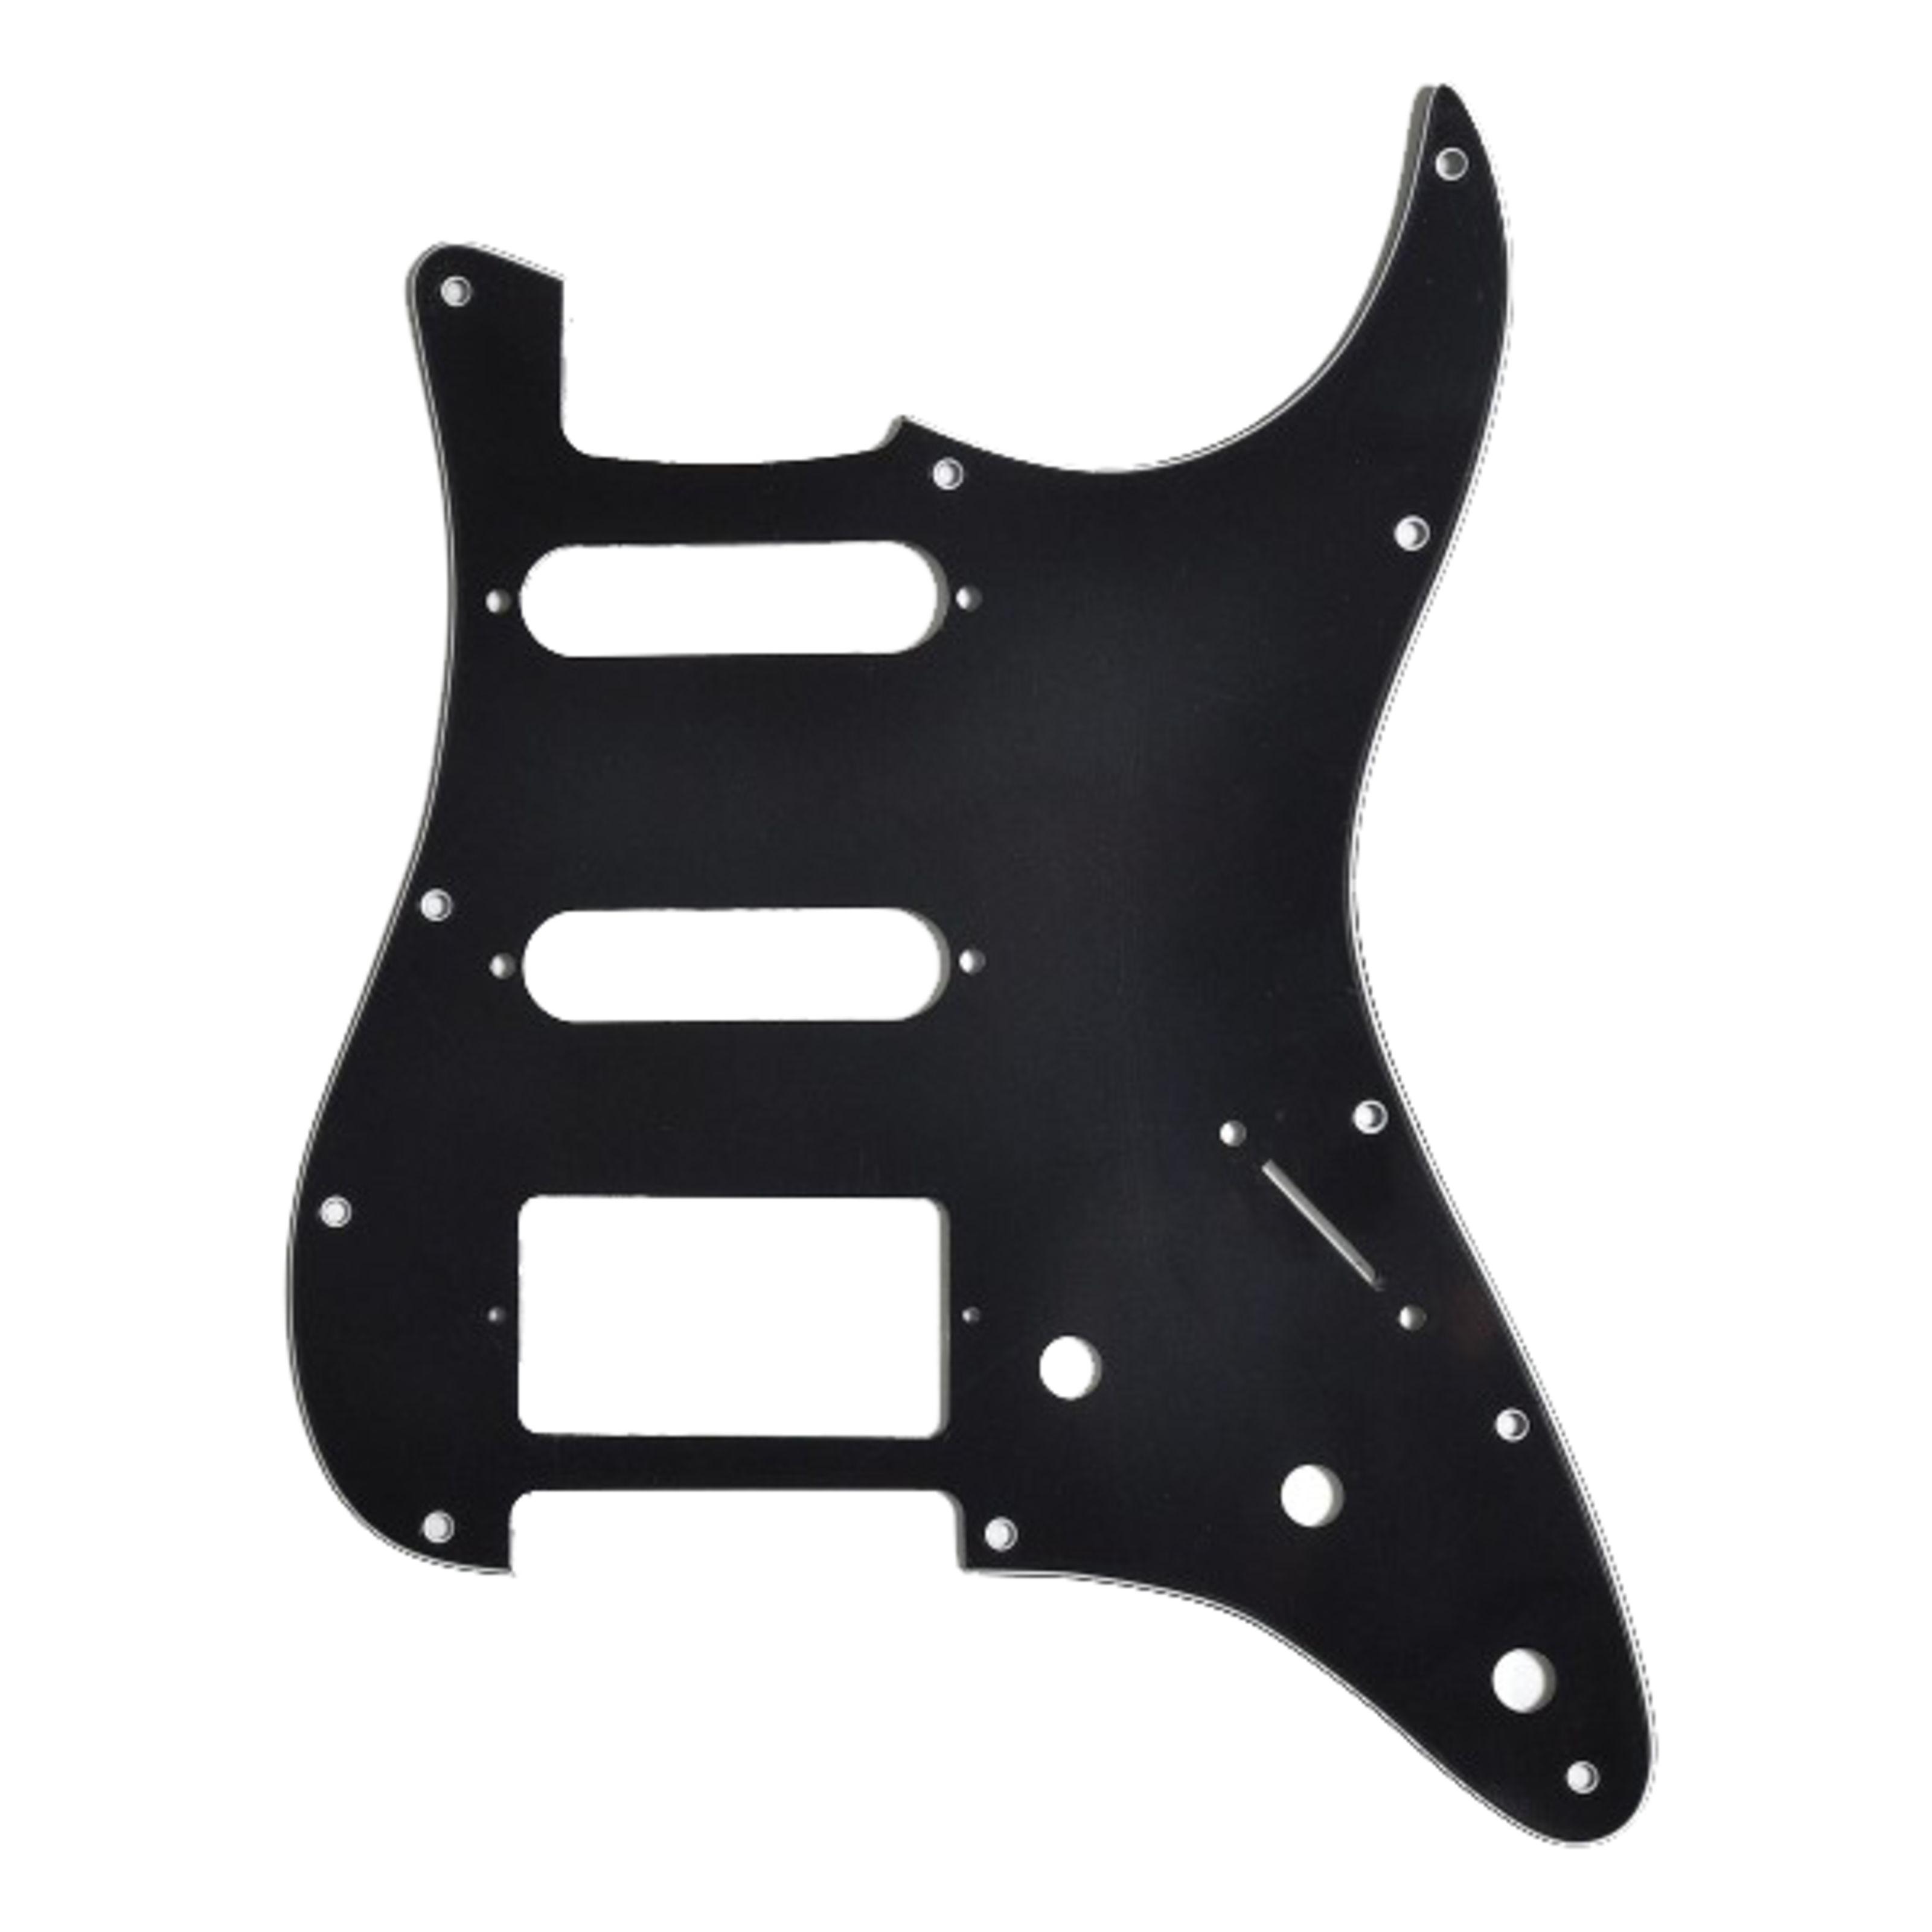 Göldo - Pickguard für HSS ST-Style Black Schlagbrett PG13B